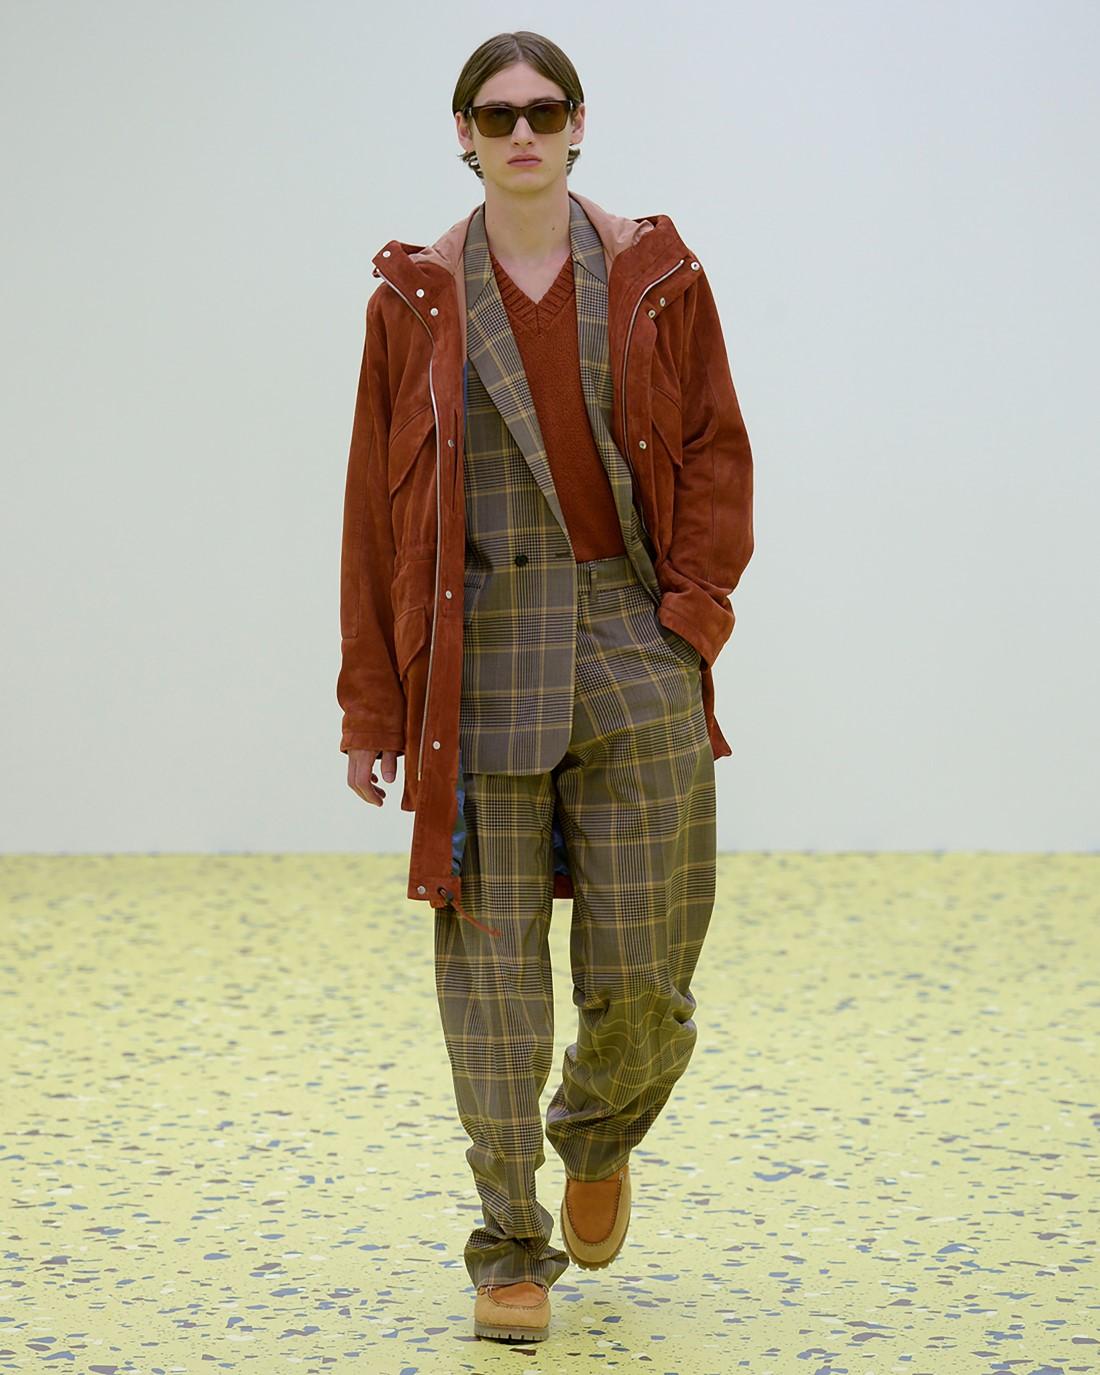 Paul Smith - Printemps-Été 2022 - Paris Fashion Week